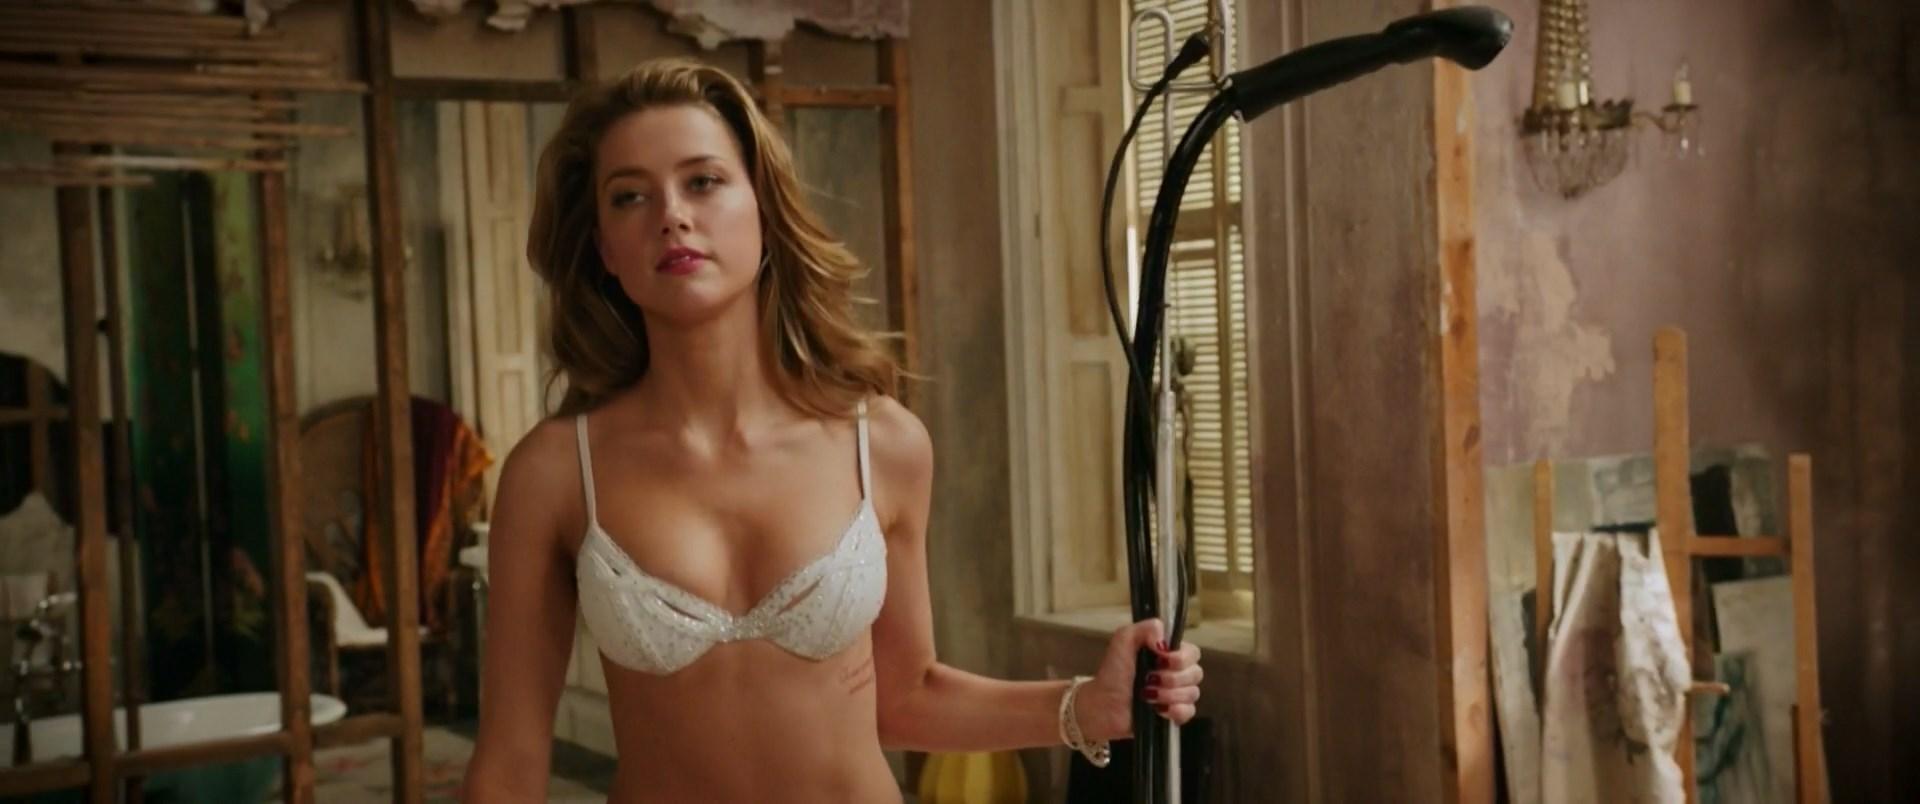 Amanda Heard Nude Pics nude video celebs » amber heard nude - london fields (2018)